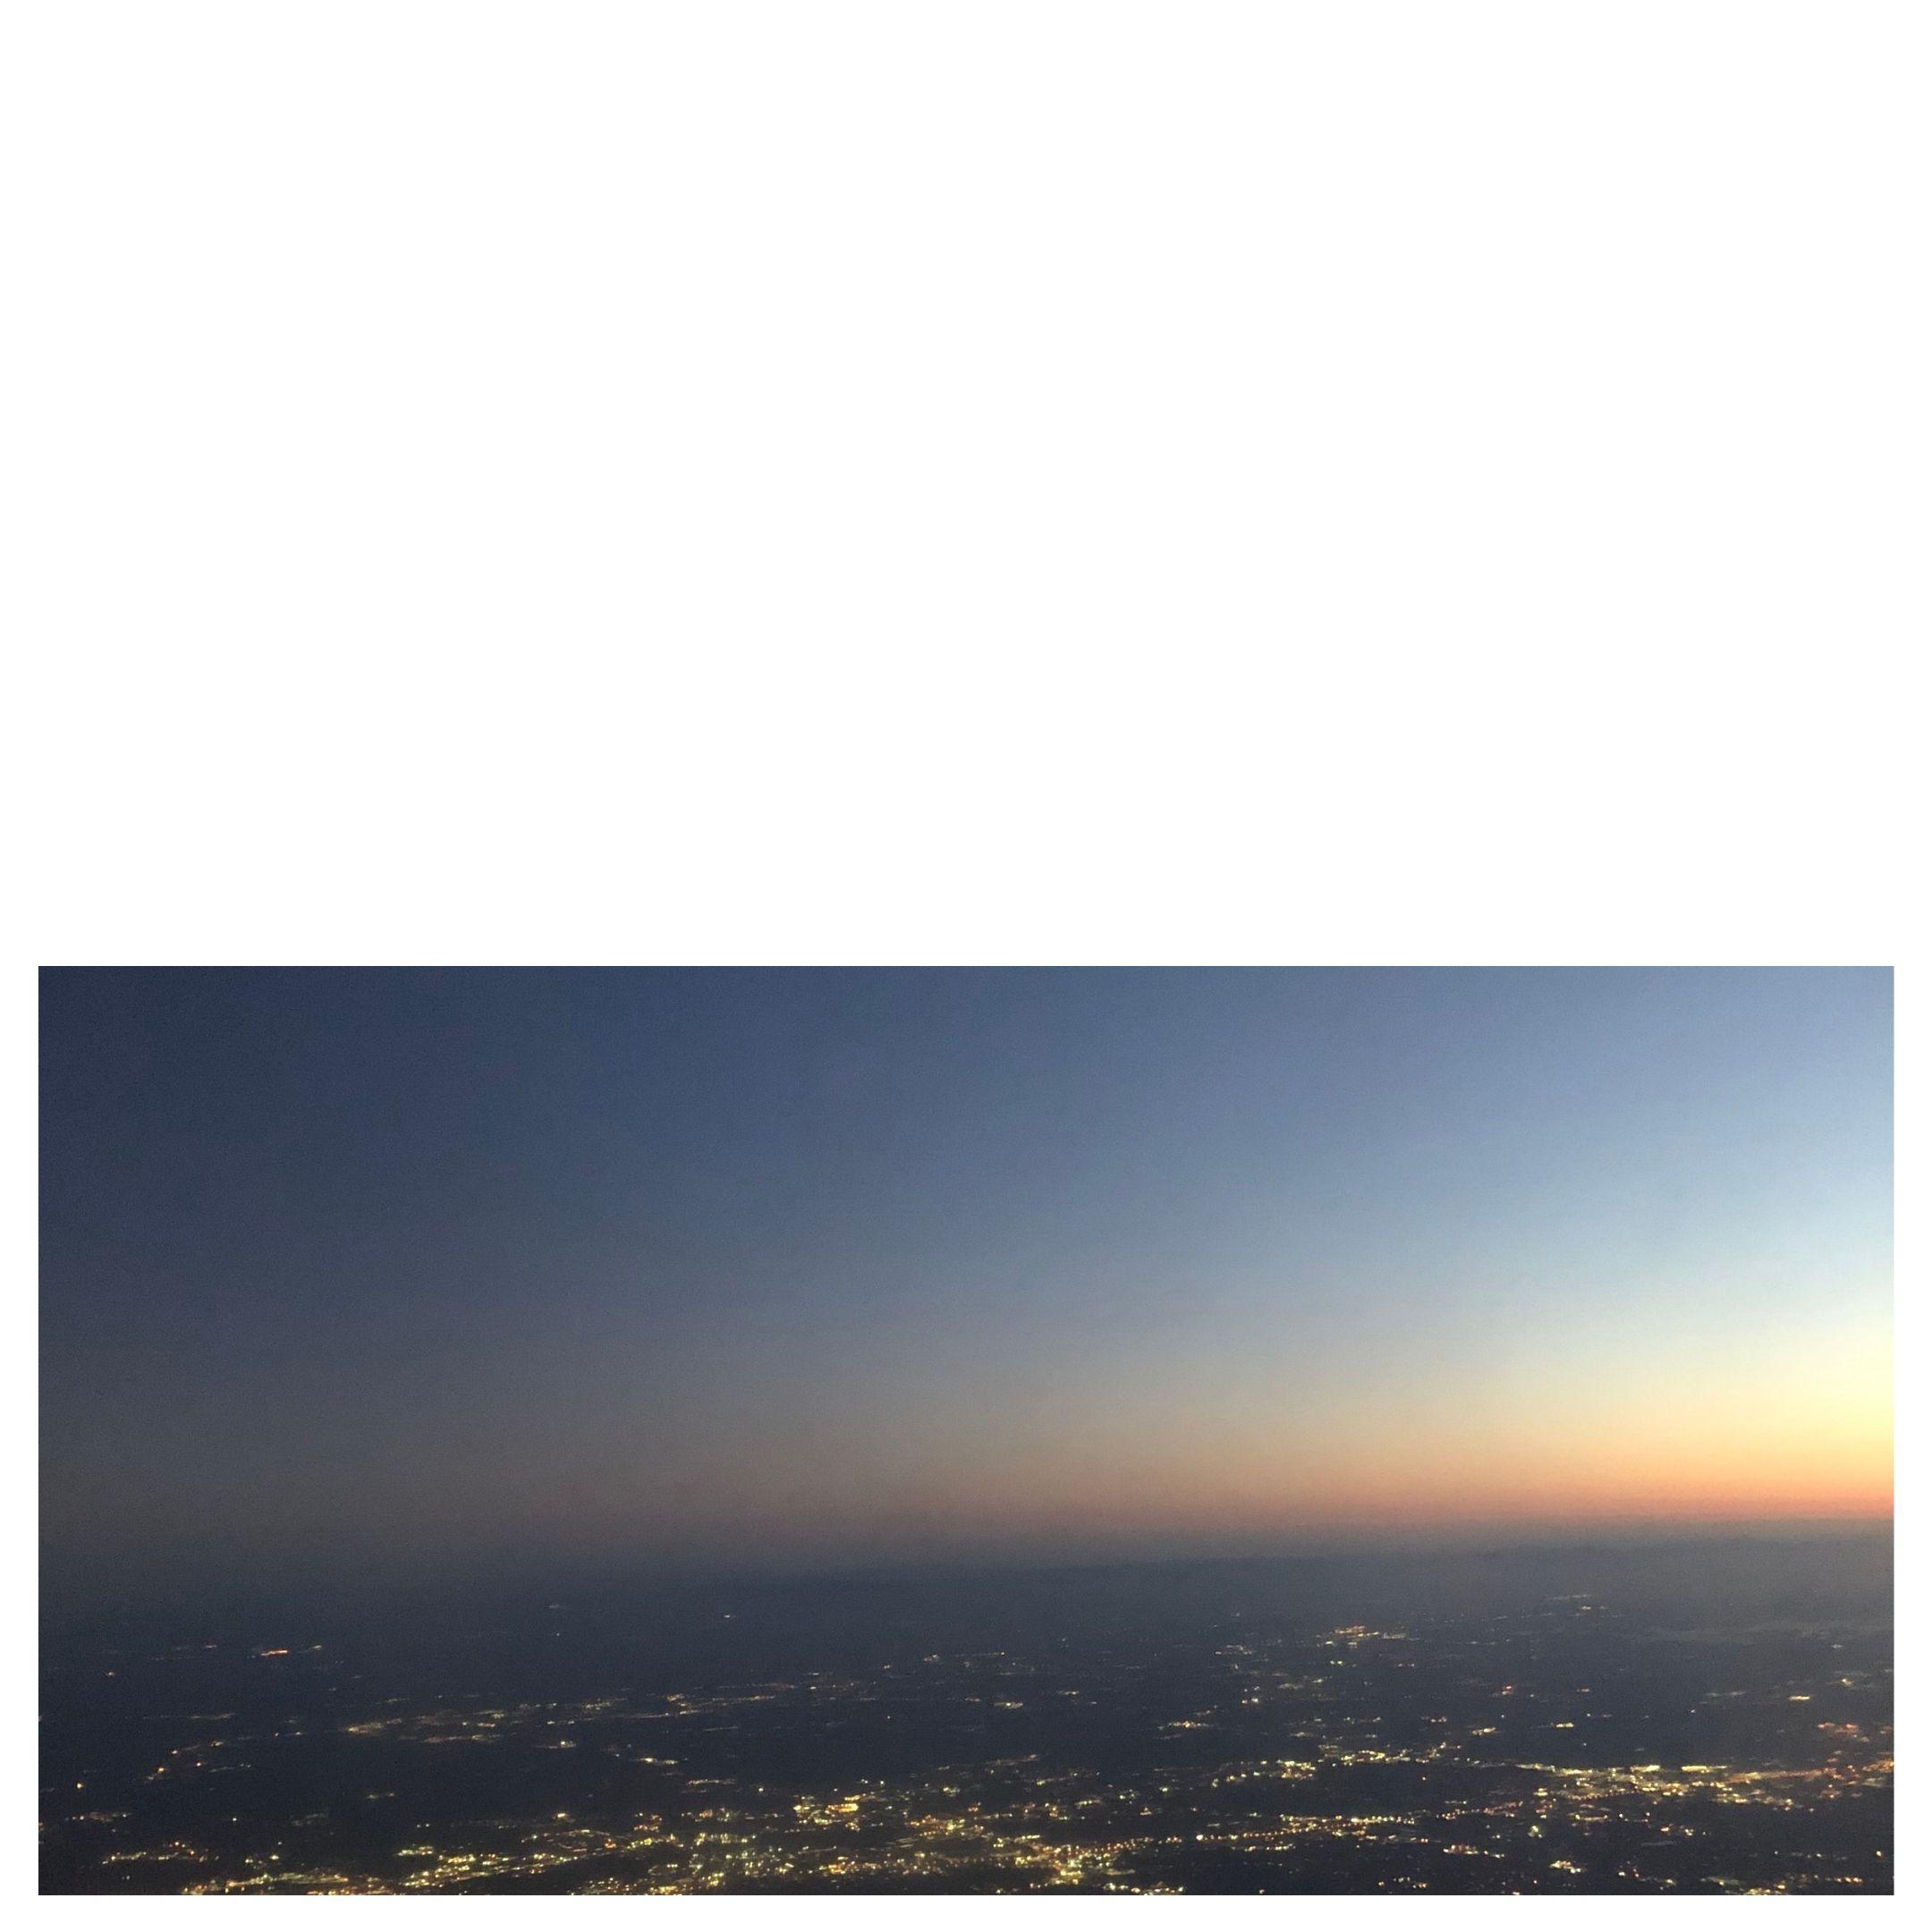 sunrise from 30,000 feet